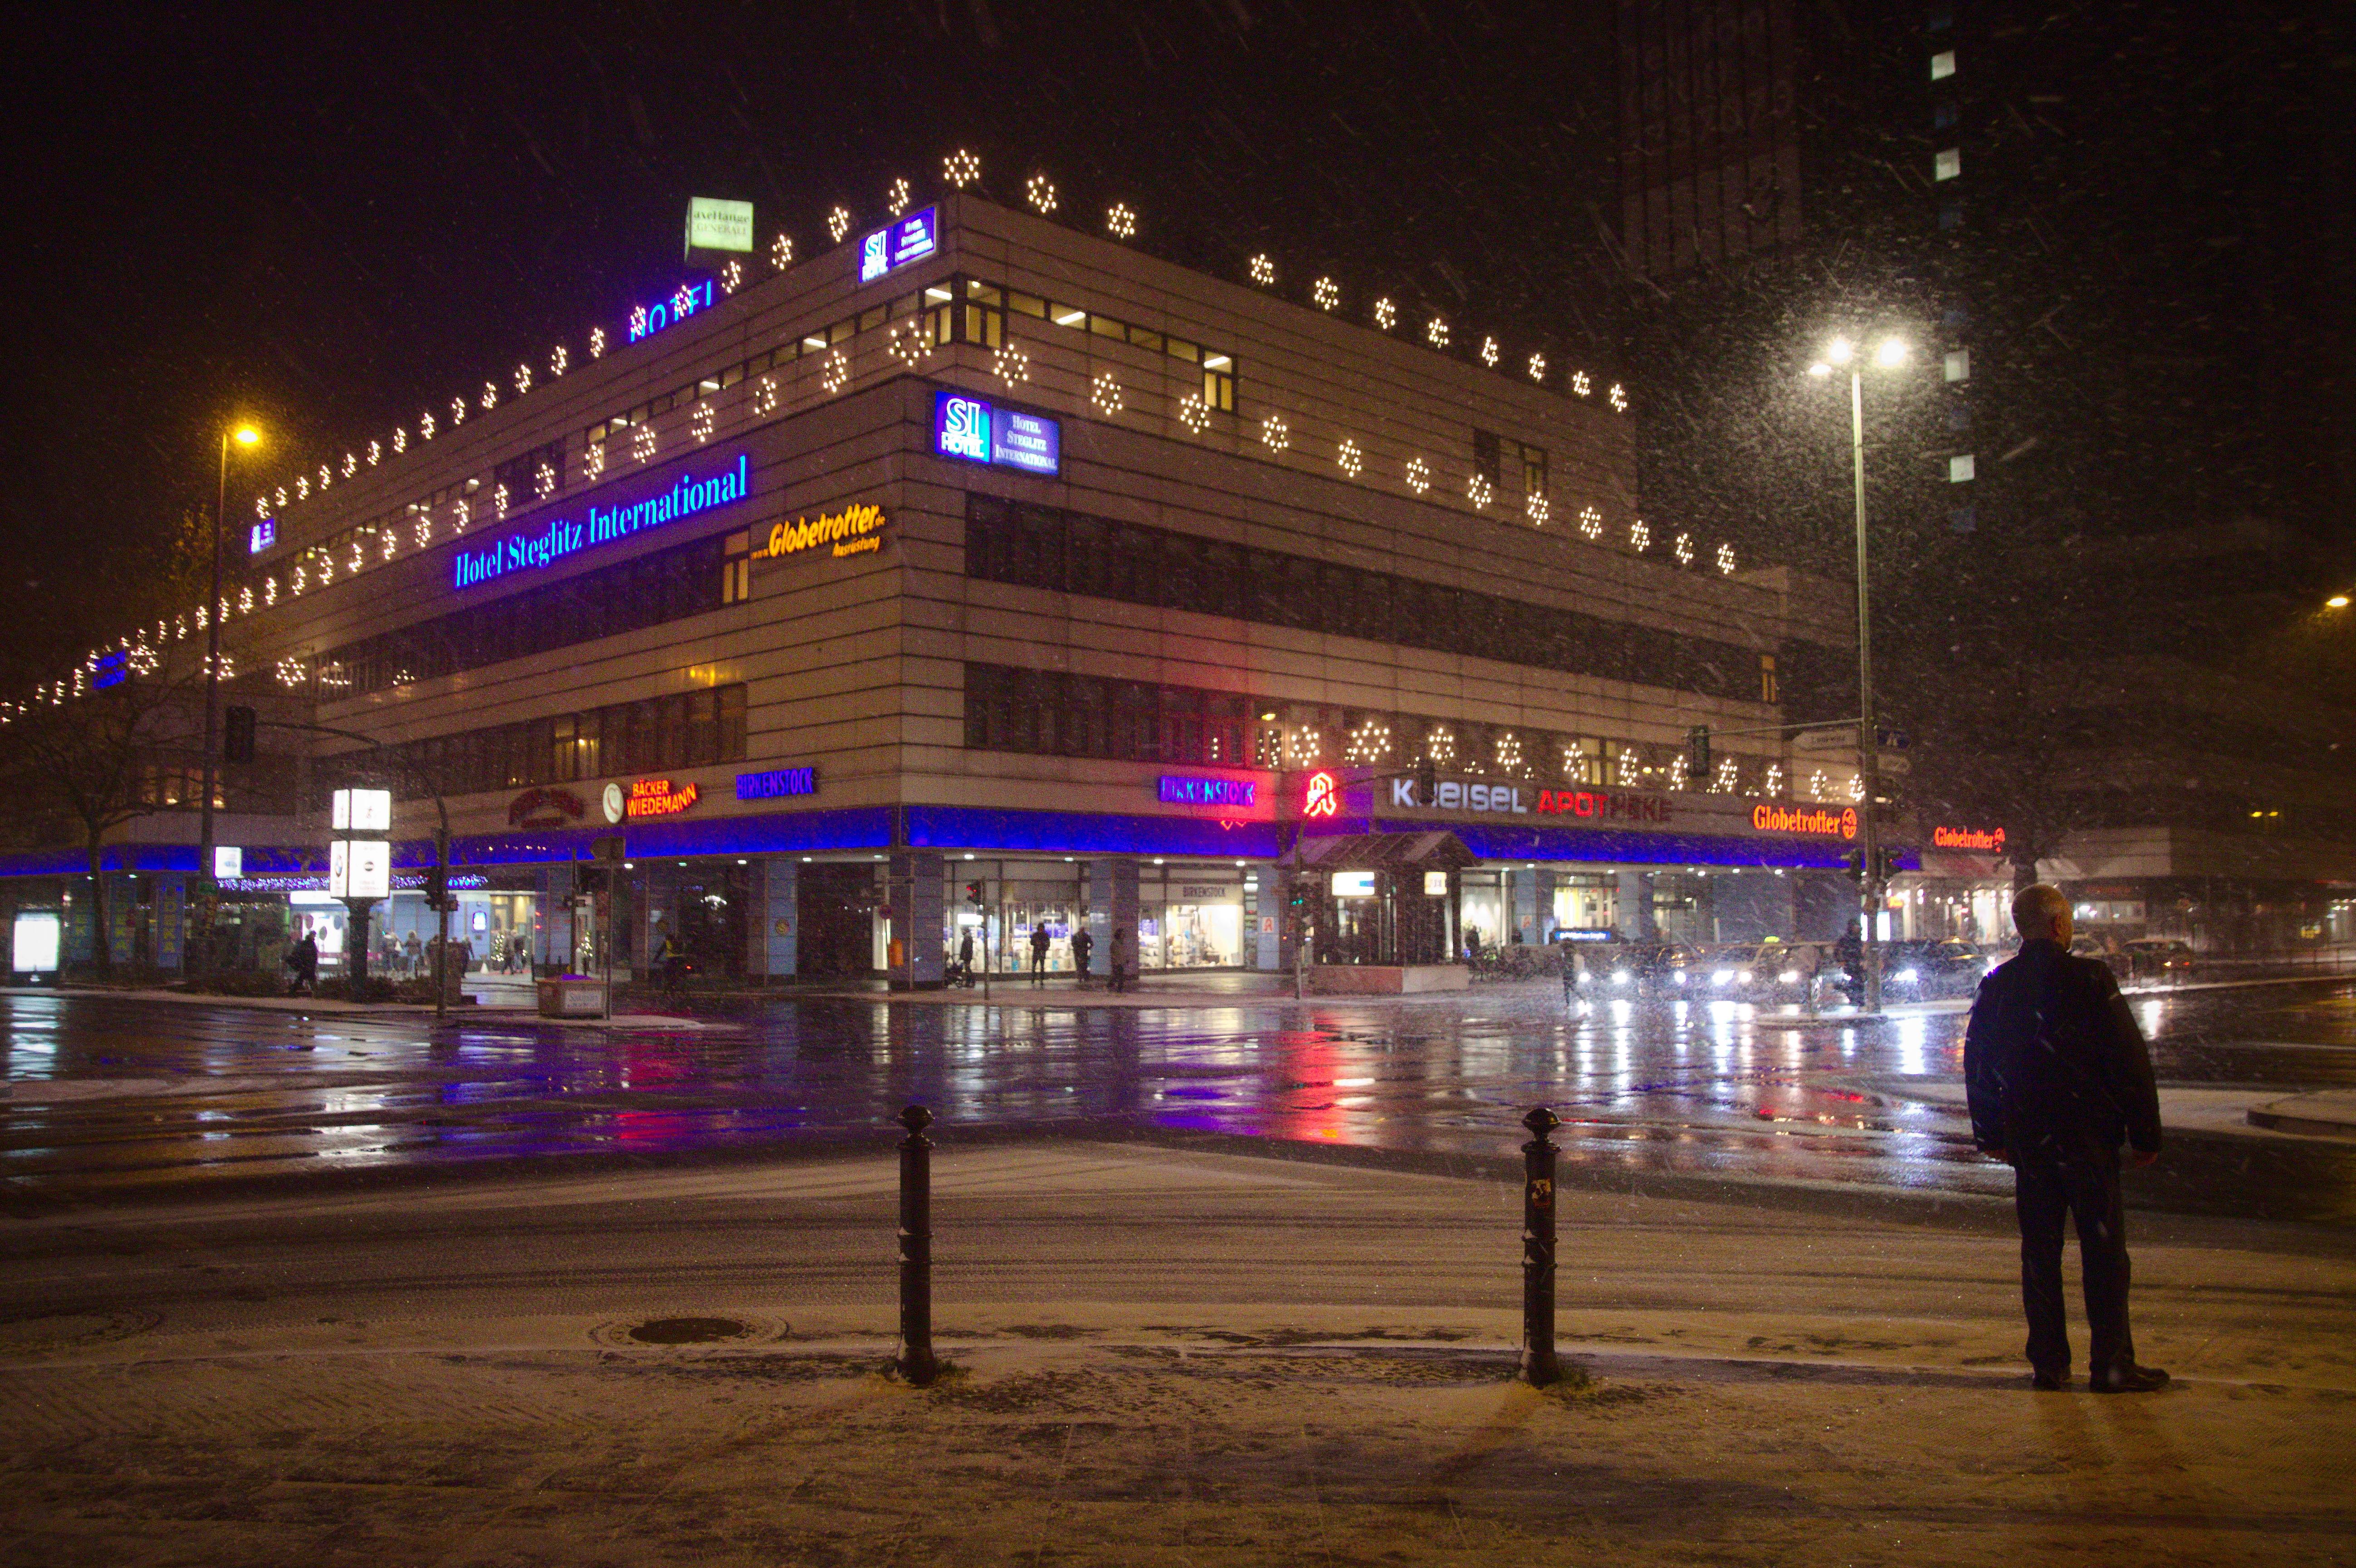 Hotel Steglitz International, Schlossstr, Steglitz, Road, Night, Intersection, City, HQ Photo